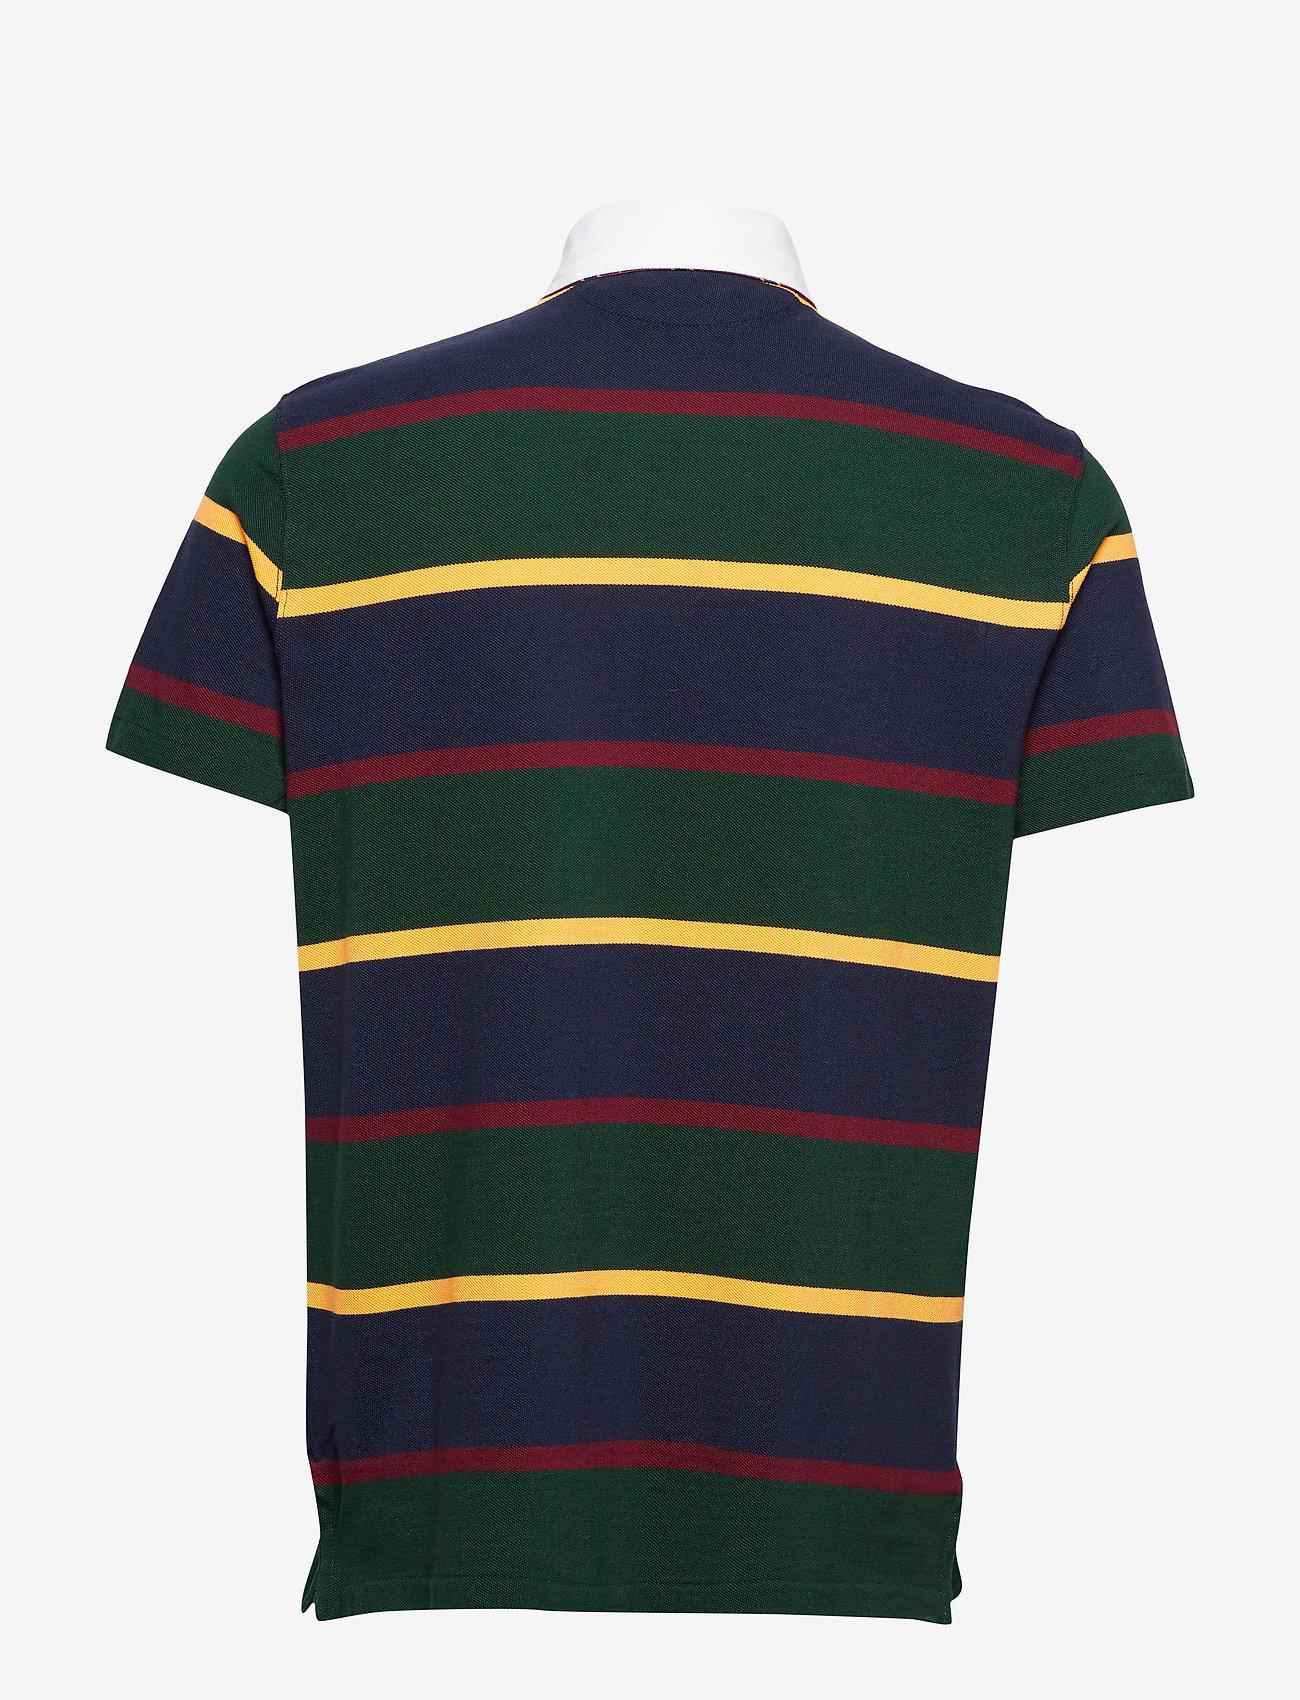 Ssrugbym3-short Sleeve-knit (College Green Mul) - Polo Ralph Lauren gpp6kB